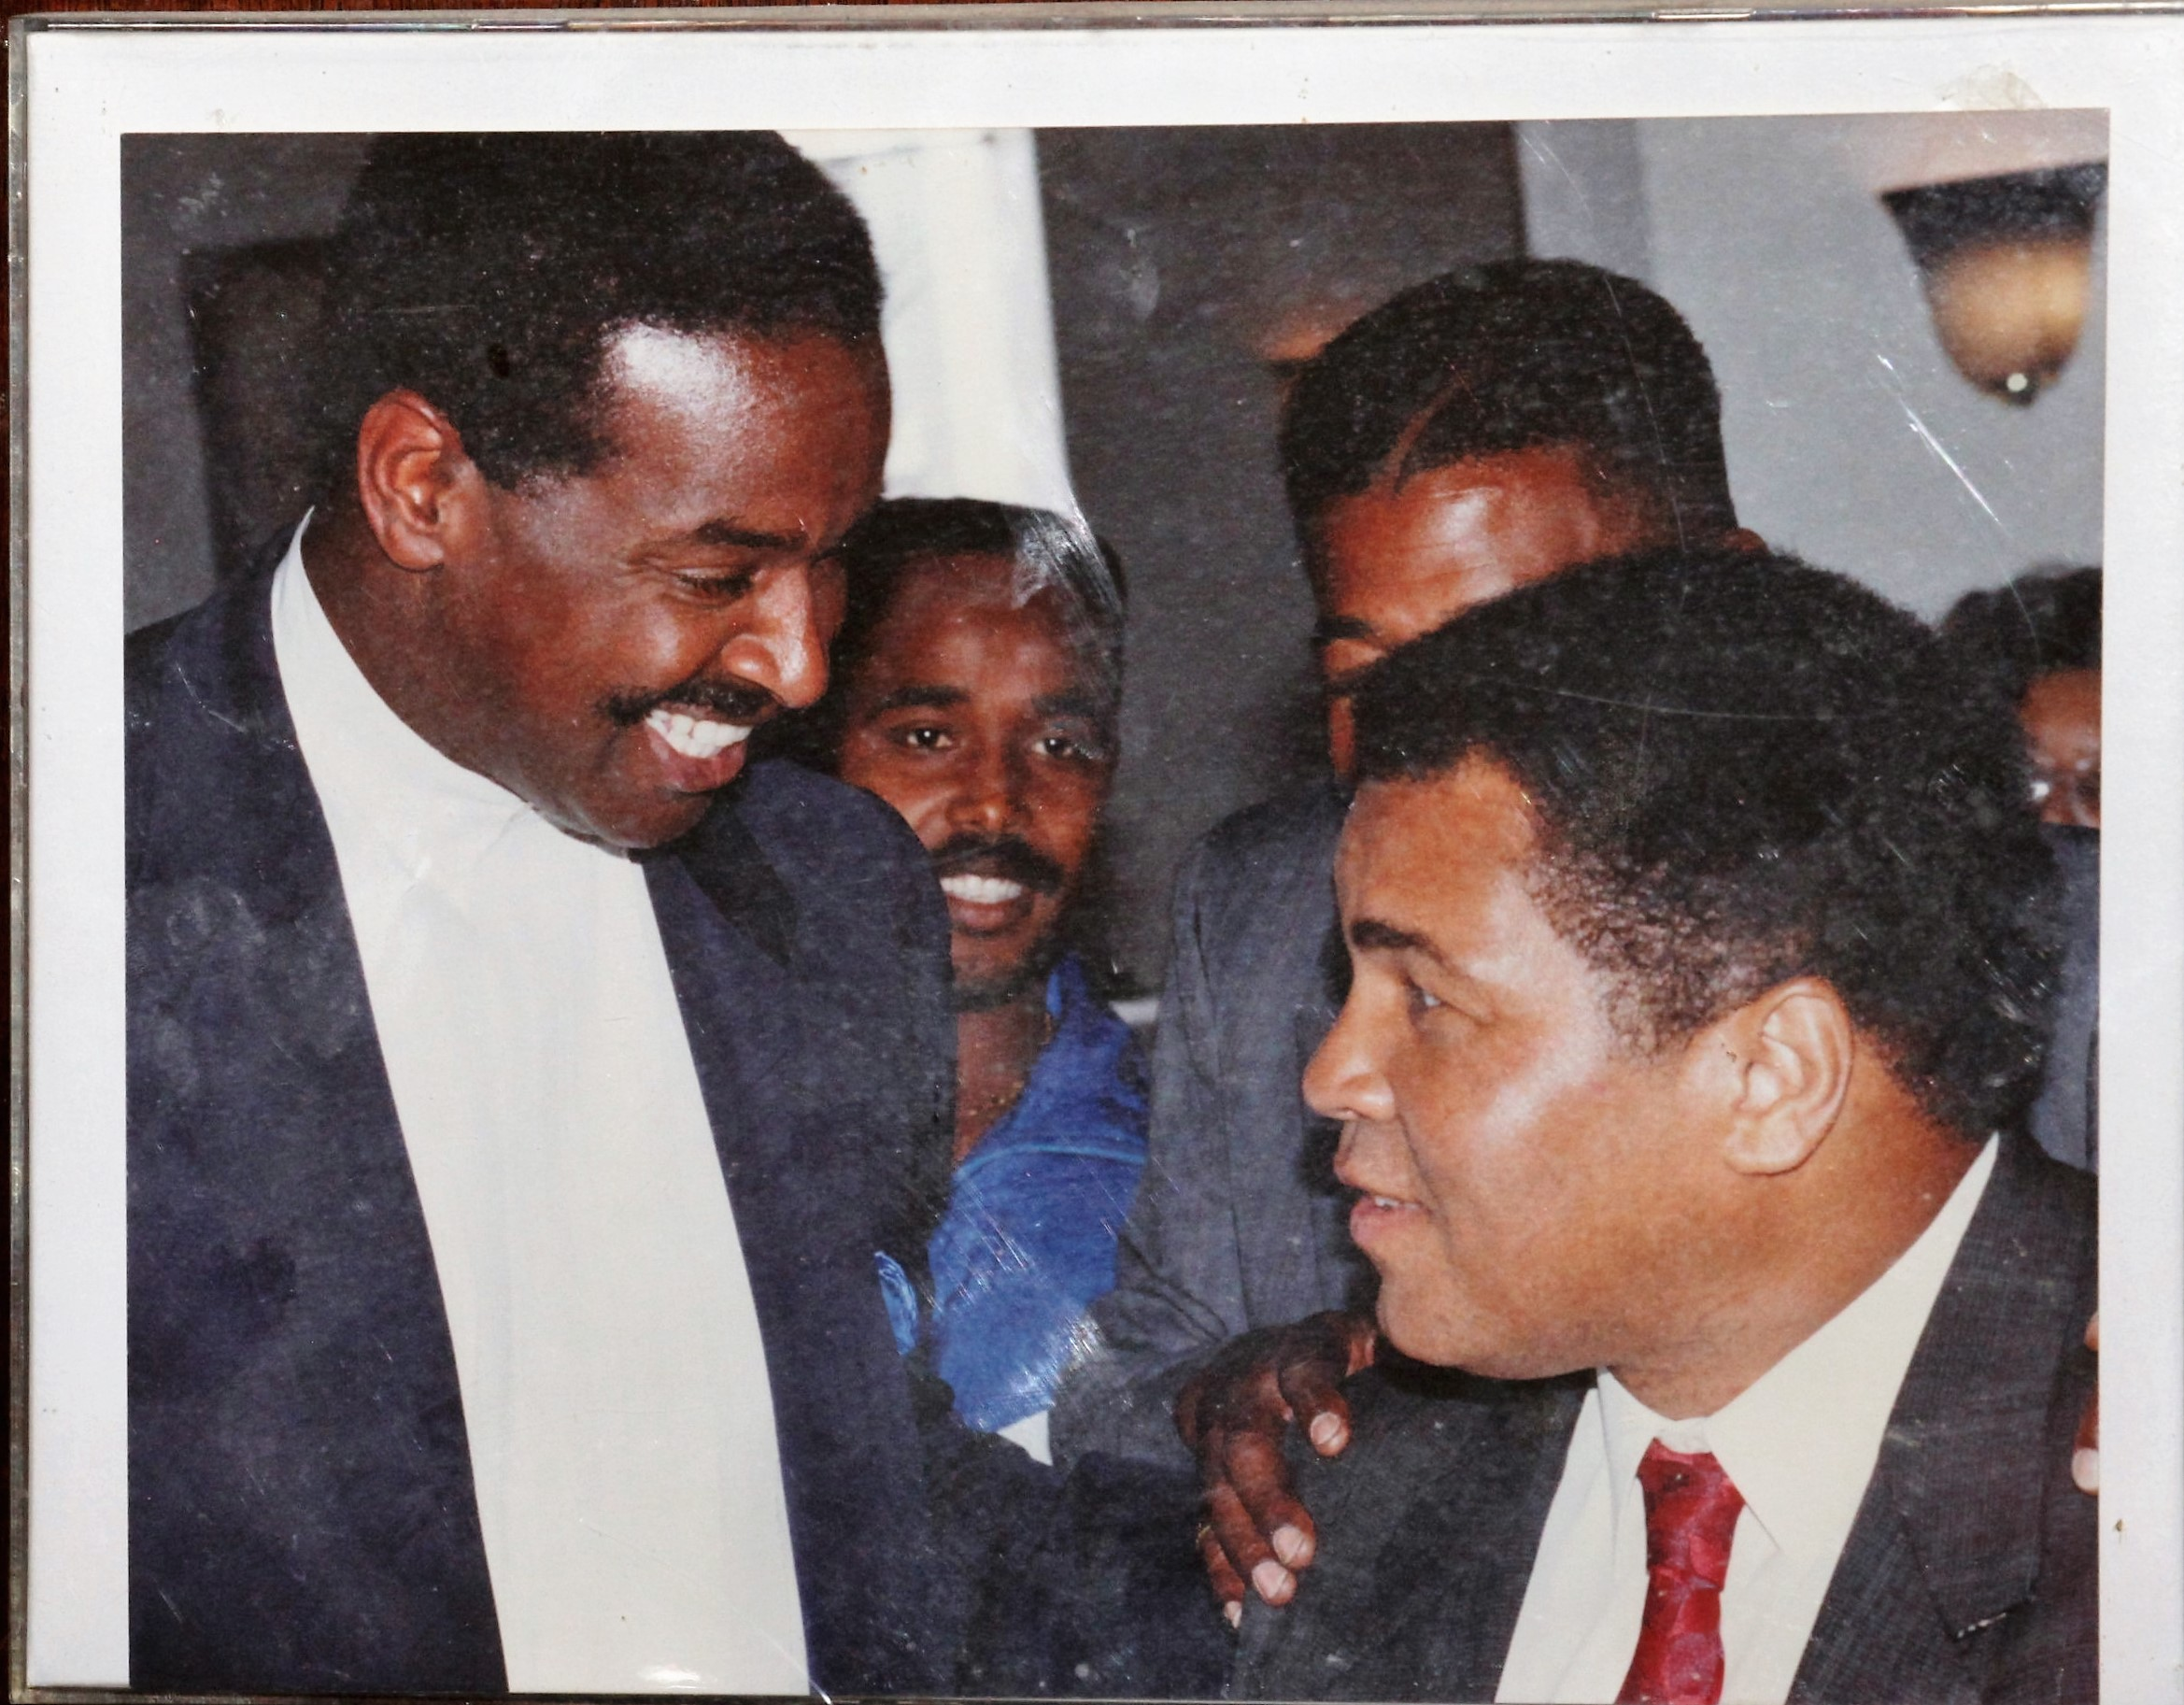 http://geoffreyslive.com/wp-content/uploads/2015/01/Geoffrey-Pete-and-Muhammad-Ali-1.jpg